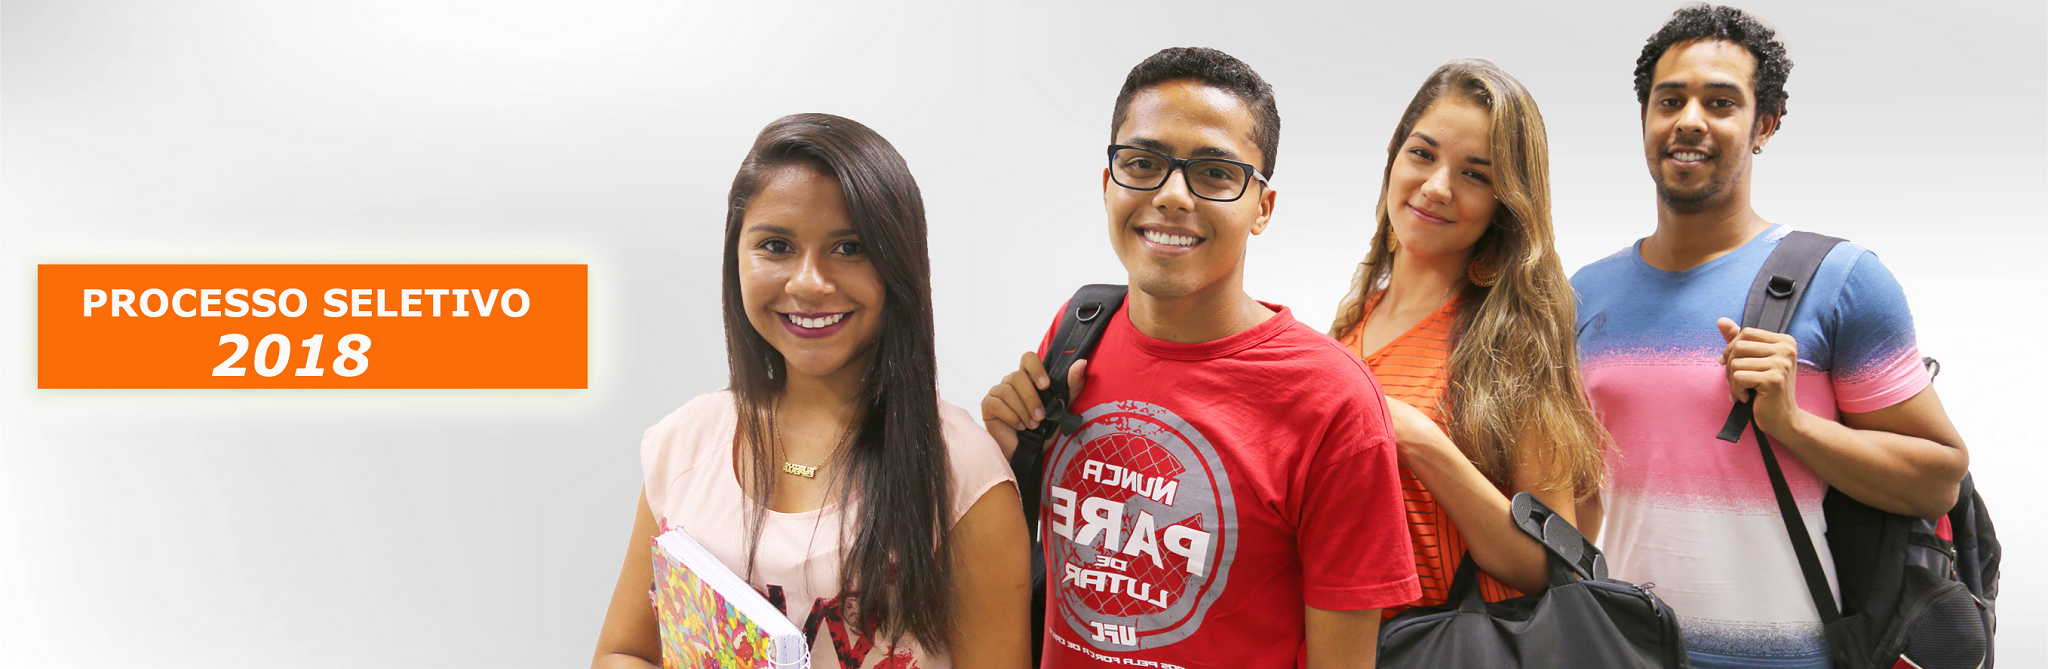 Banner com alunos da UFSB